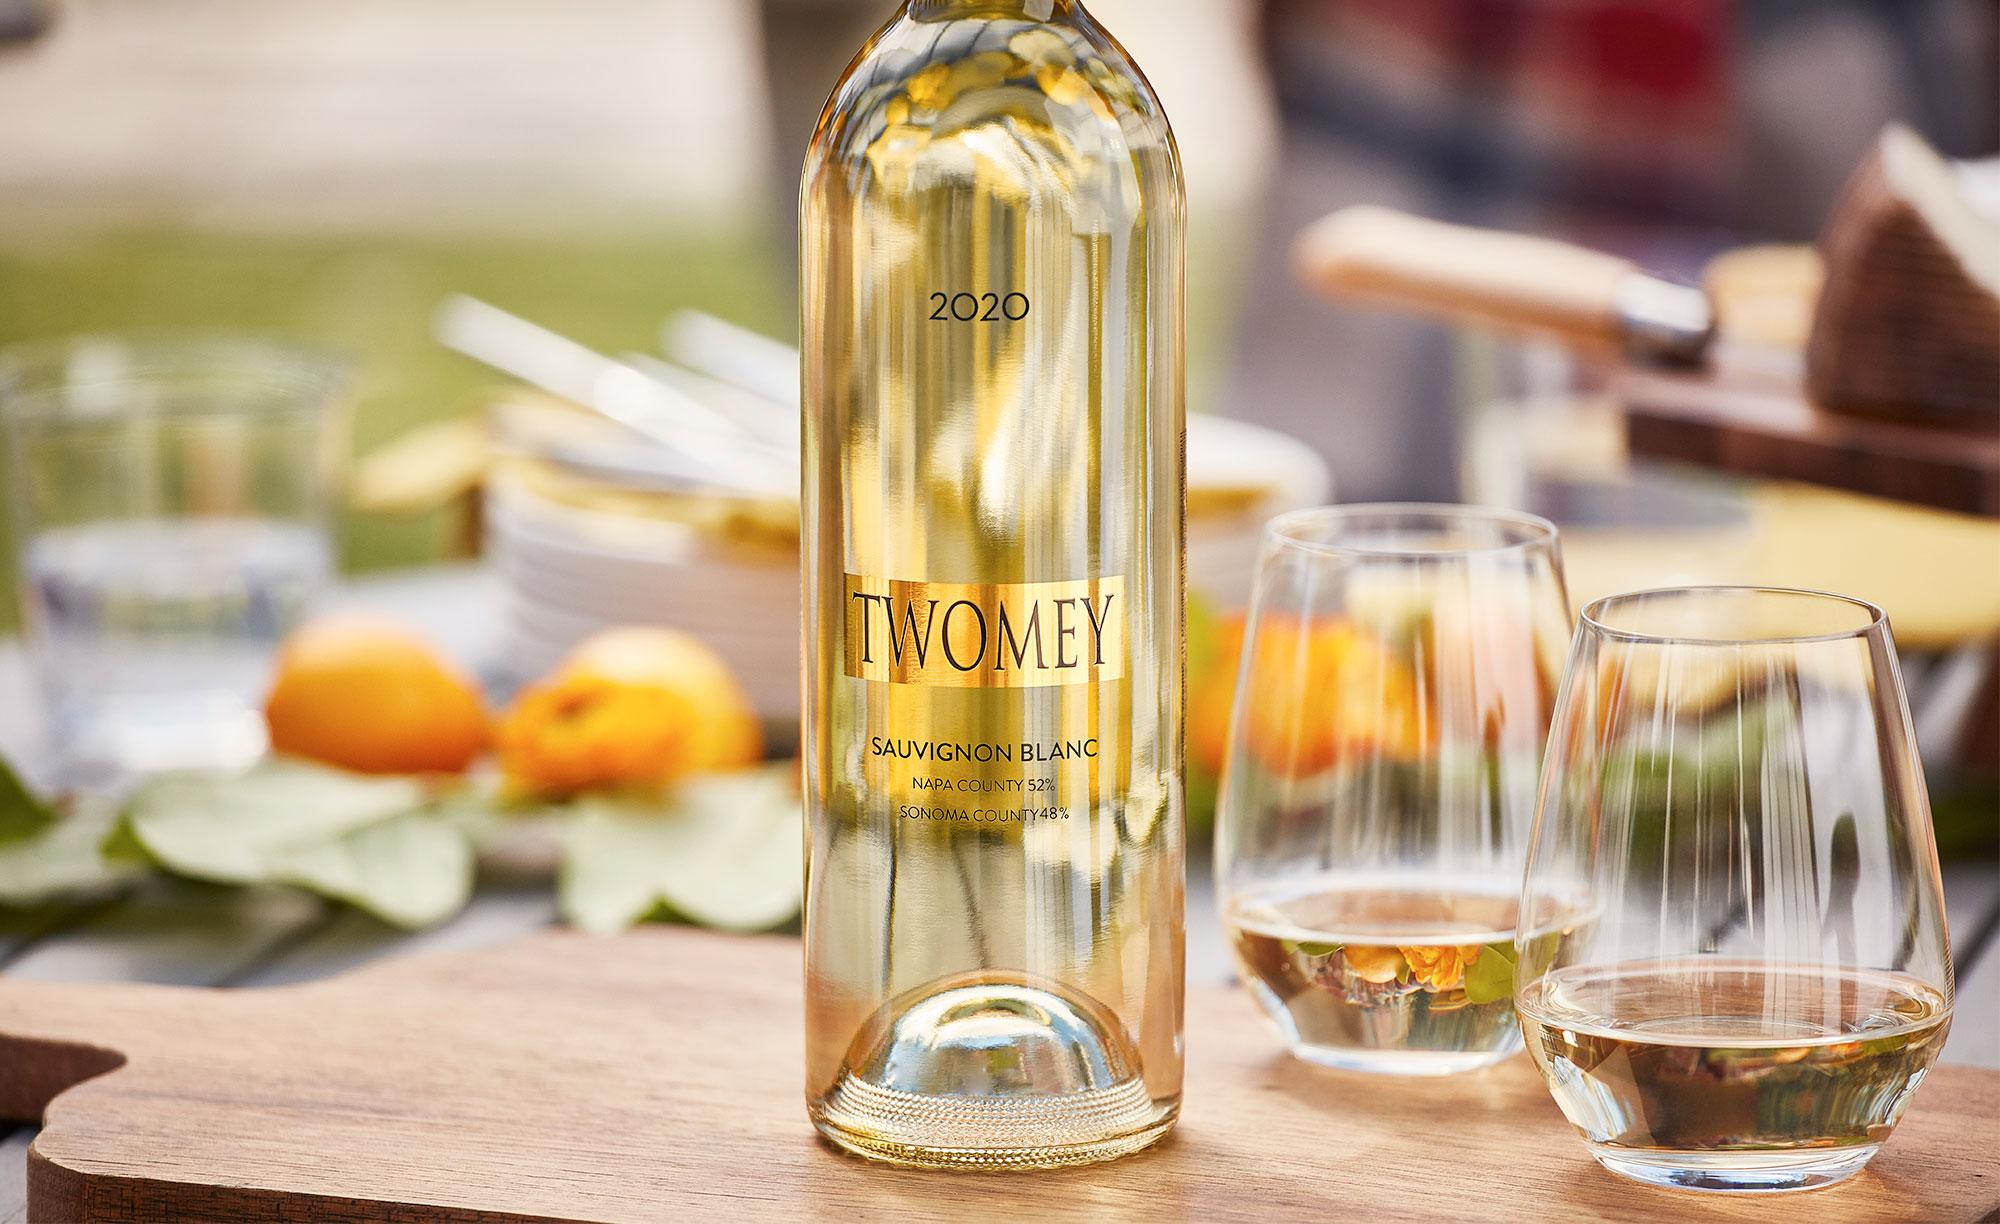 Twomey 2020 Sauvignon Blanc wine